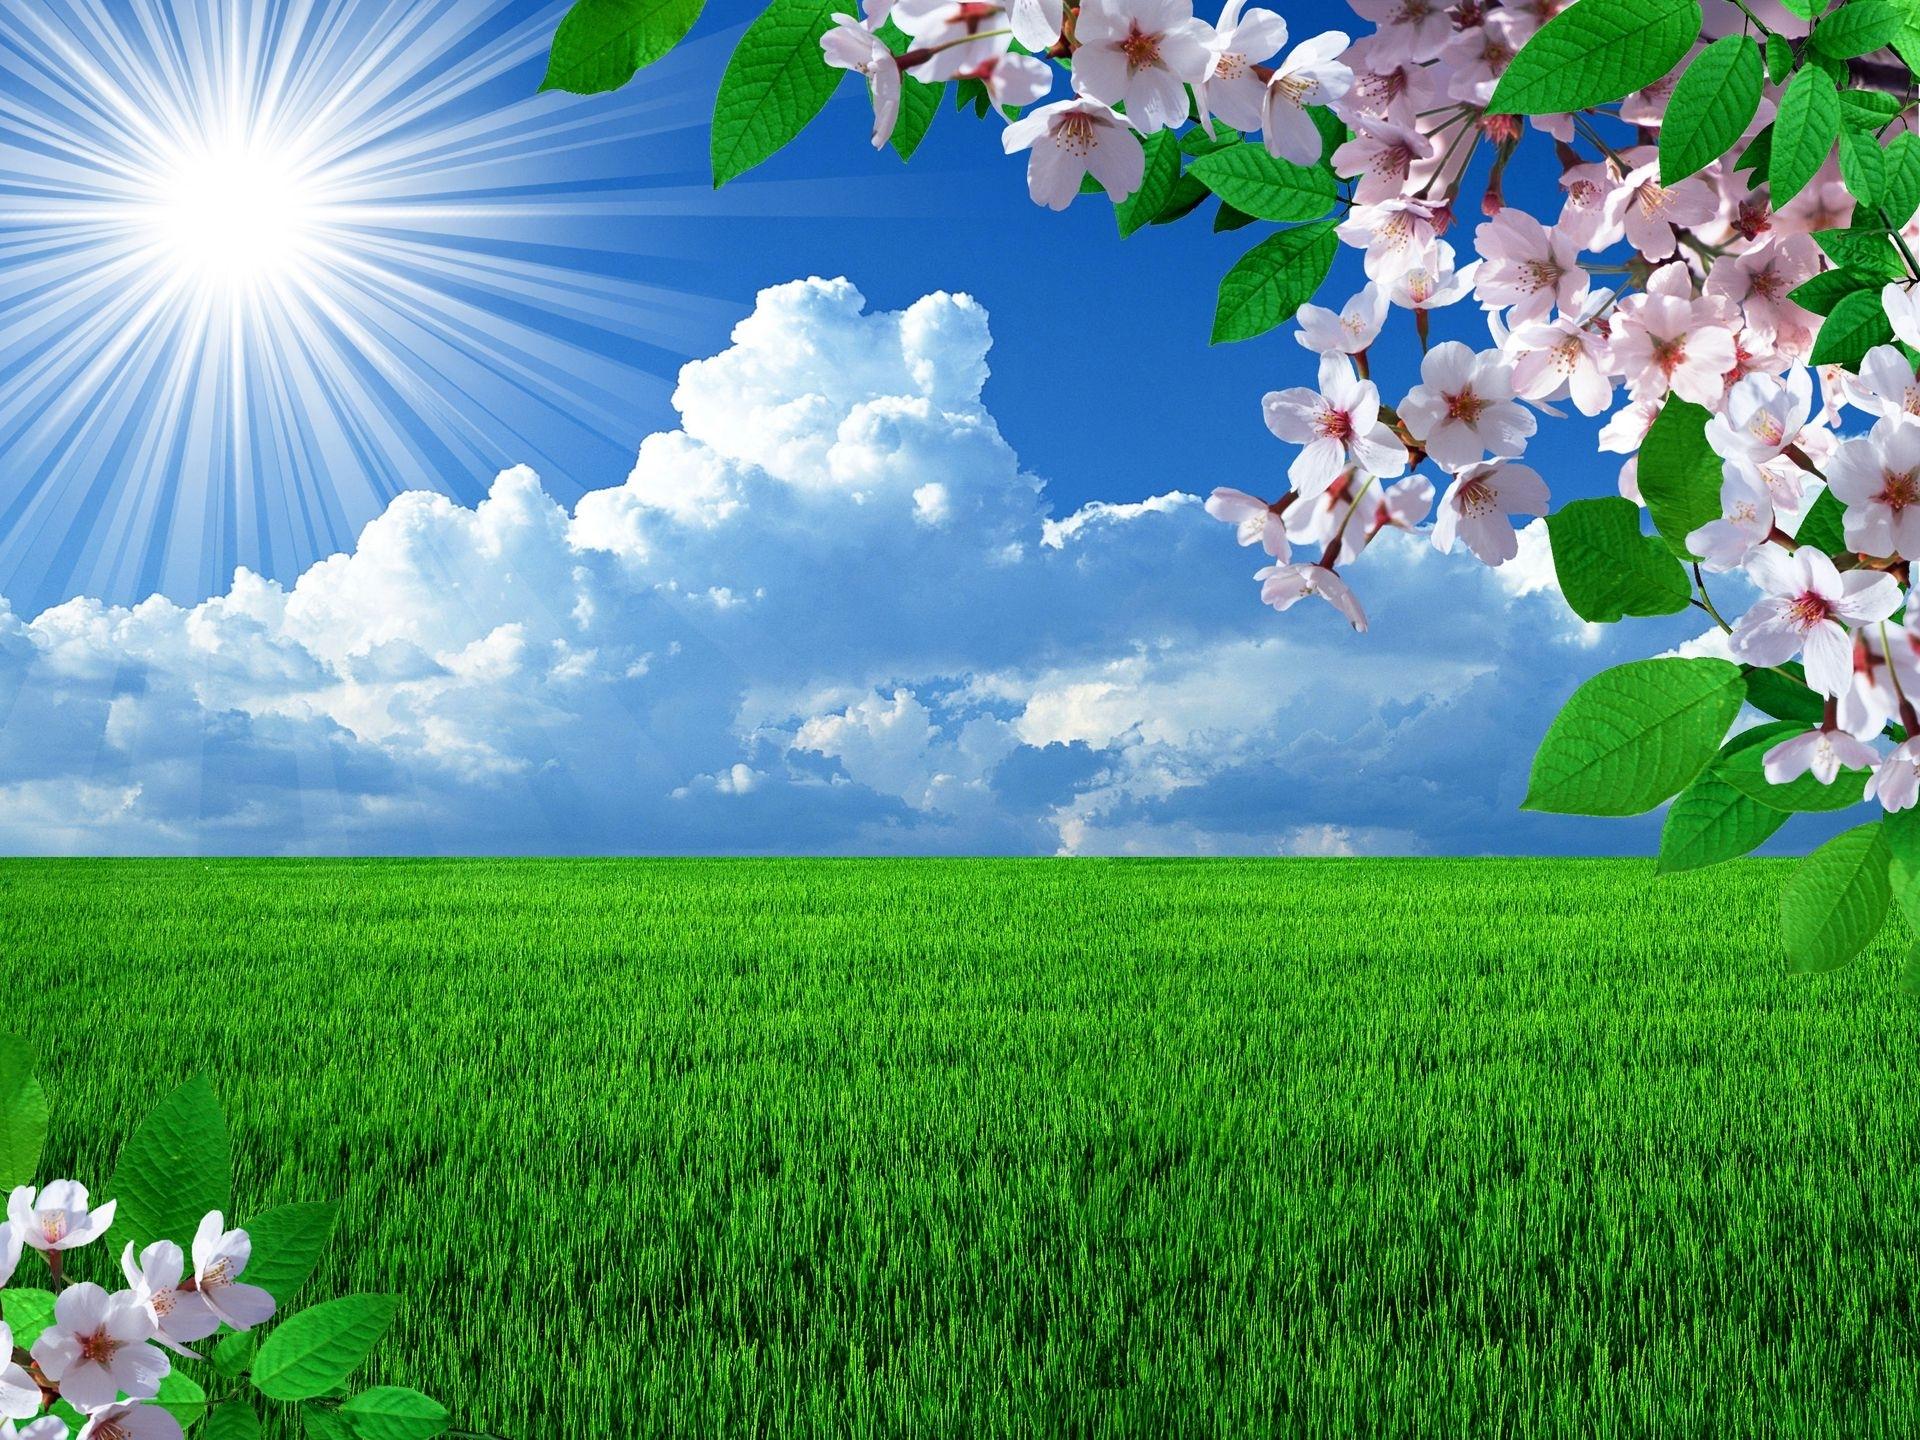 free spring desktop wallpapers backgrounds - wallpapersafari | best